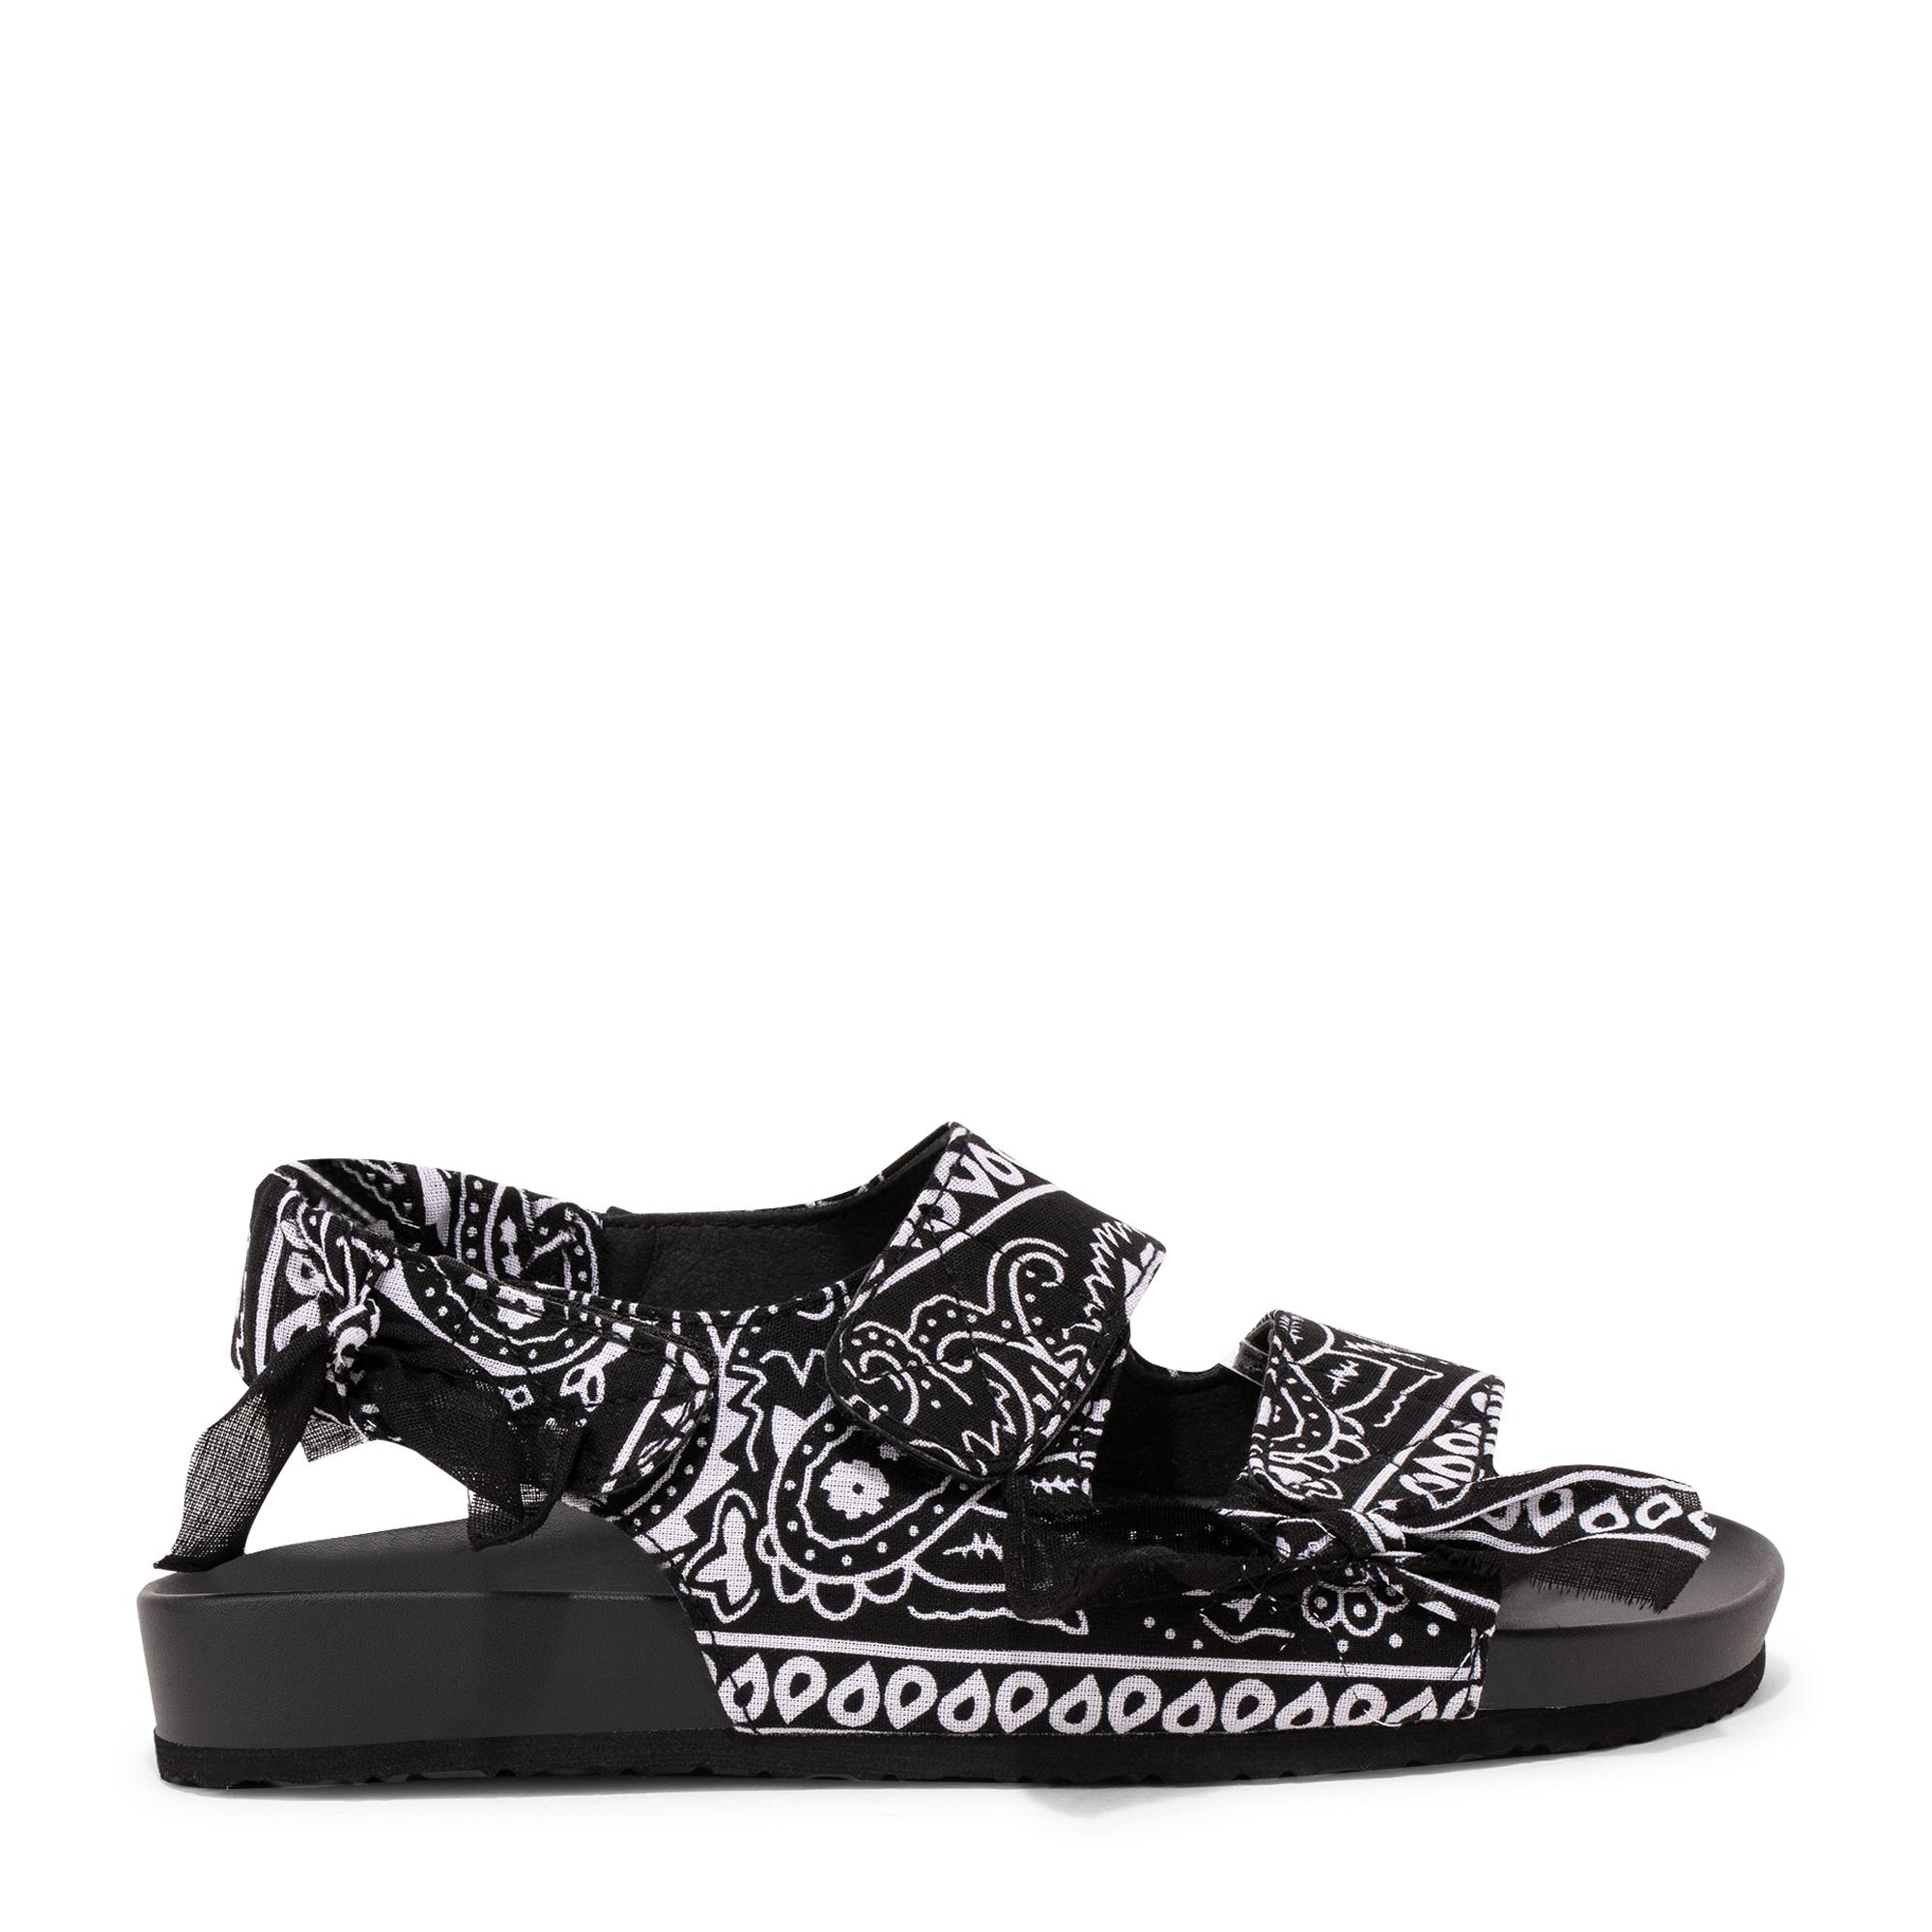 Apache sandals